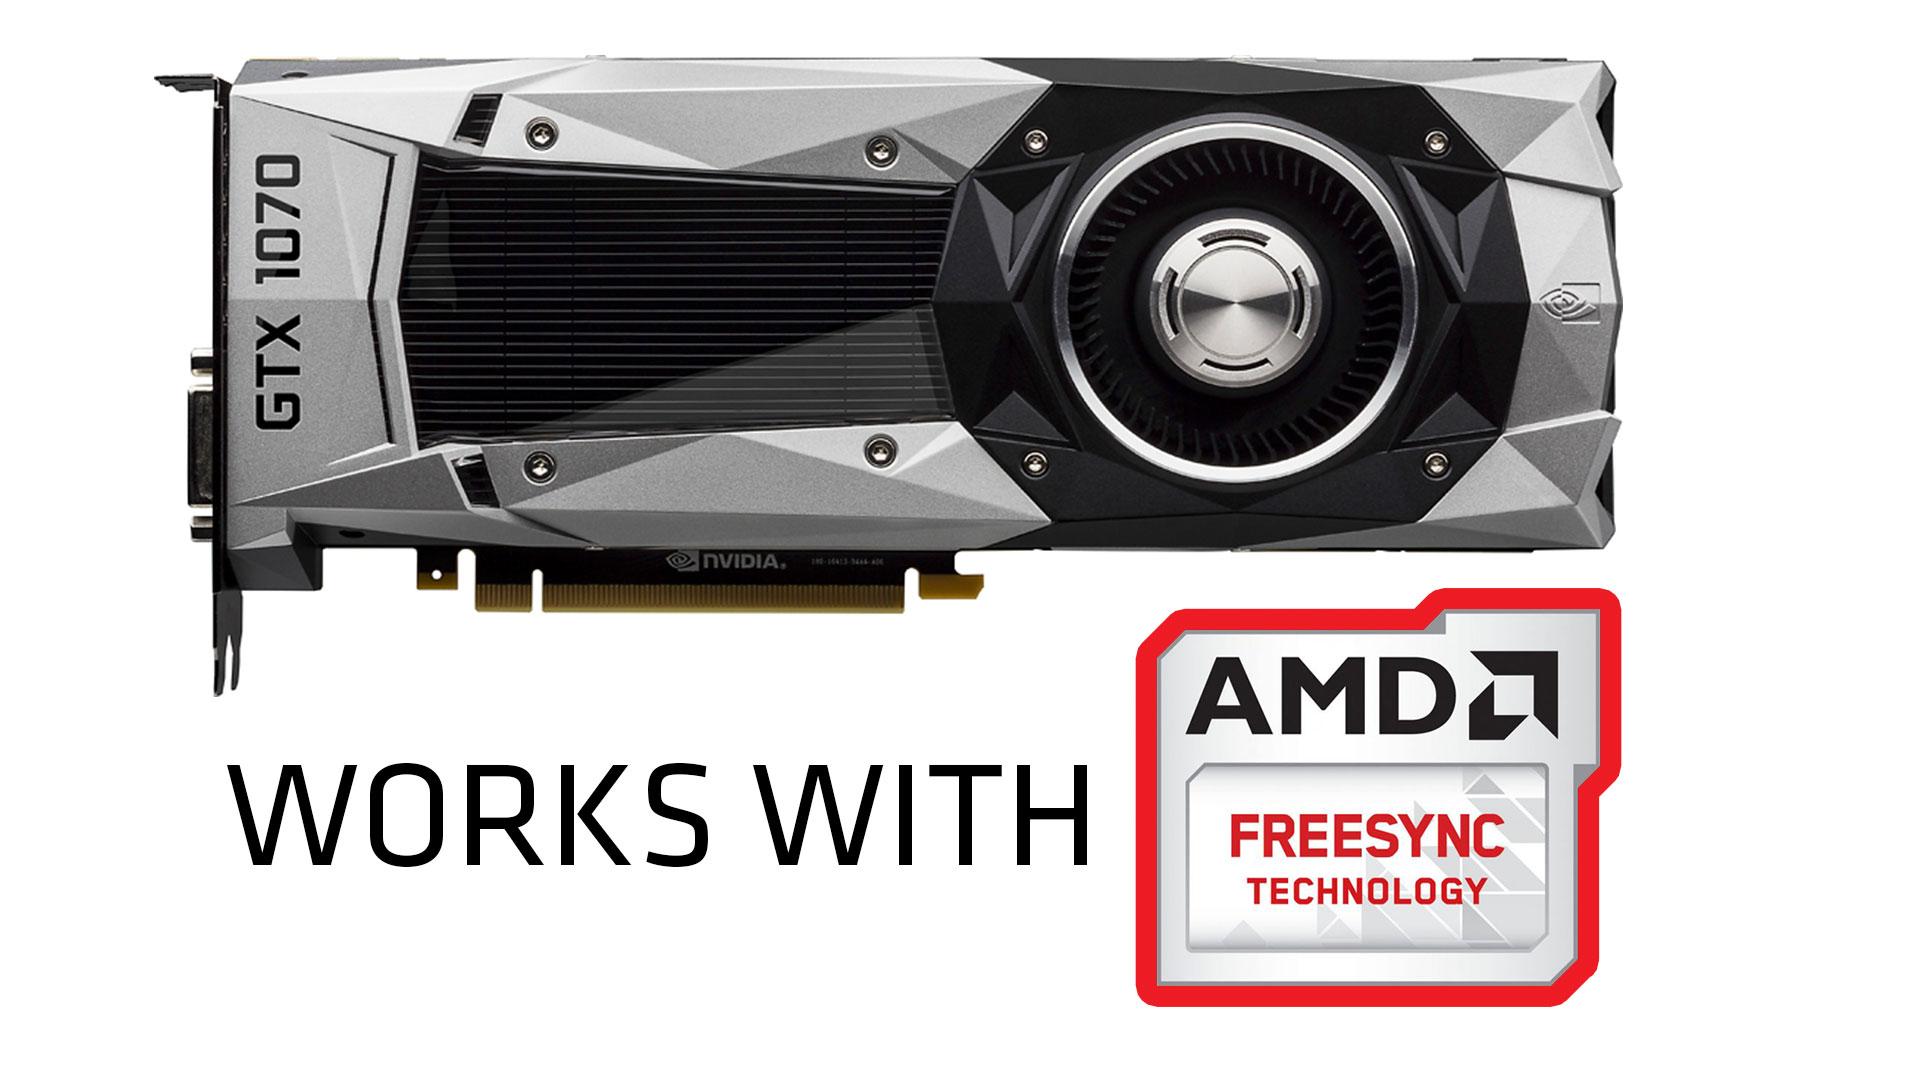 Nvidia-Grafikkarten unterstützen ab jetzt auch Freesync  PC